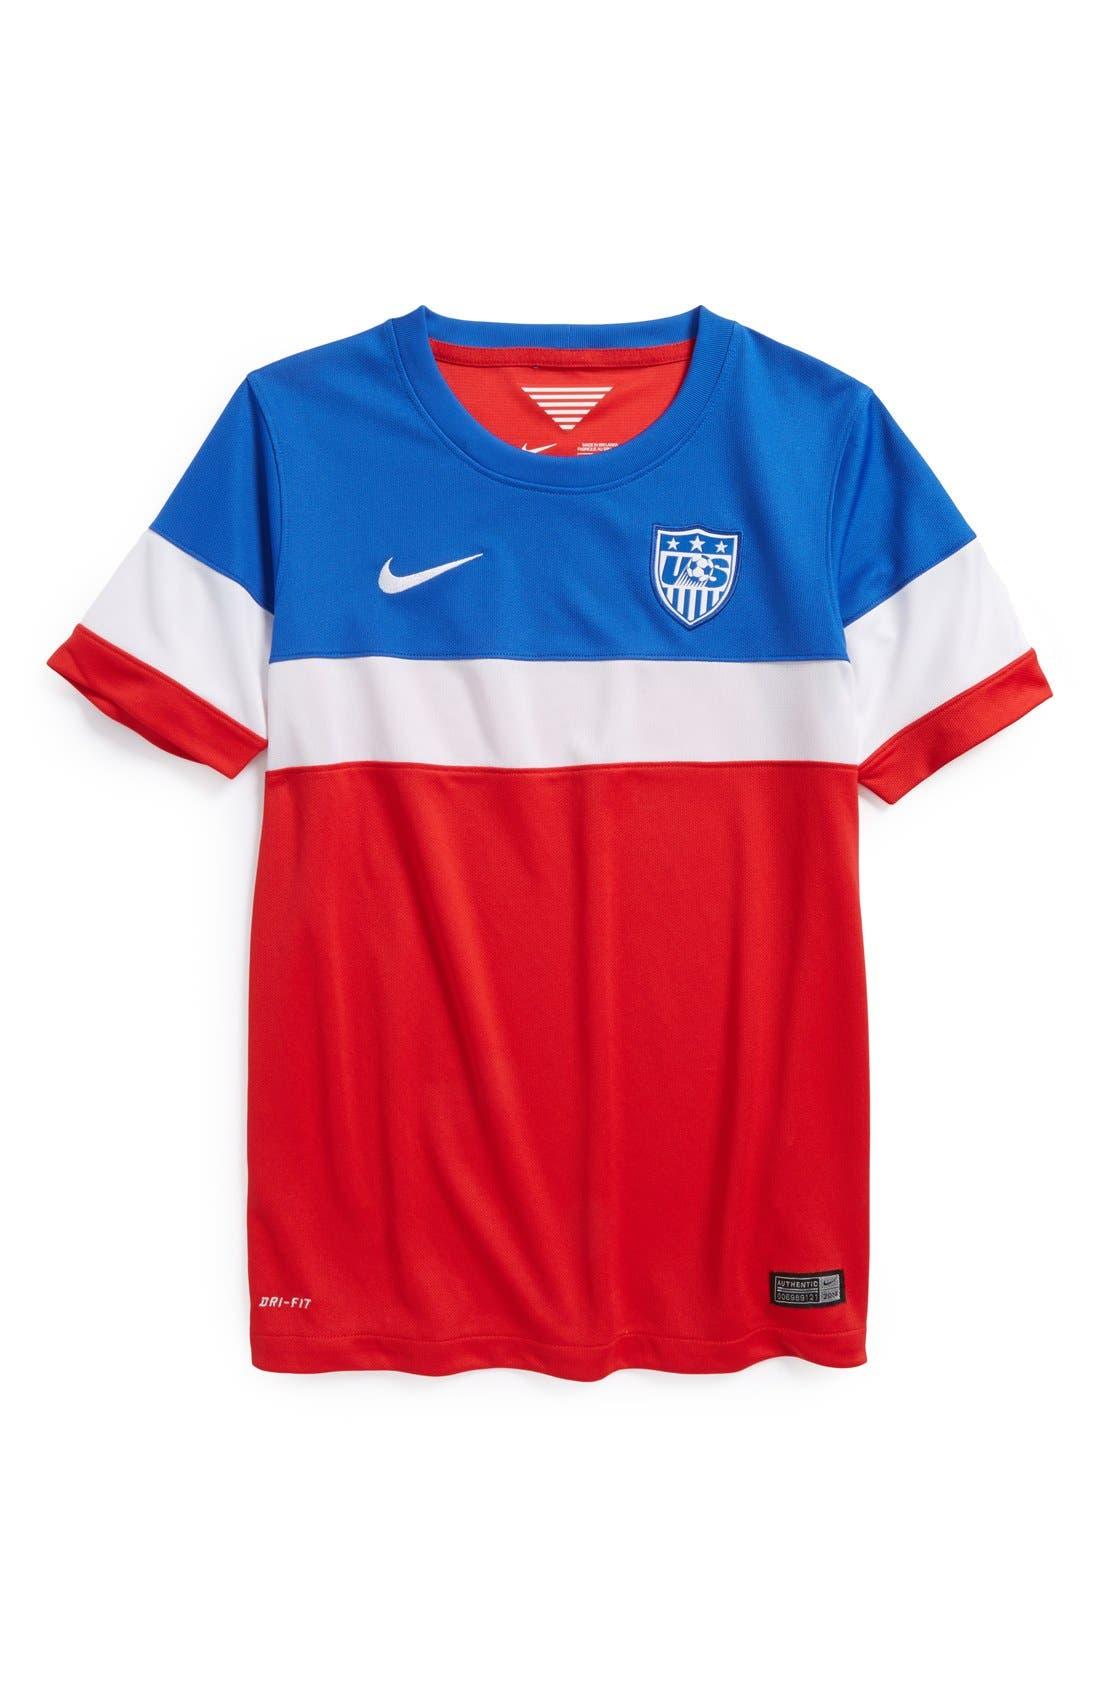 Alternate Image 1 Selected - Nike 'USA - 2014 Stadium' Dri-FIT World Soccer Jersey (Big Boys)